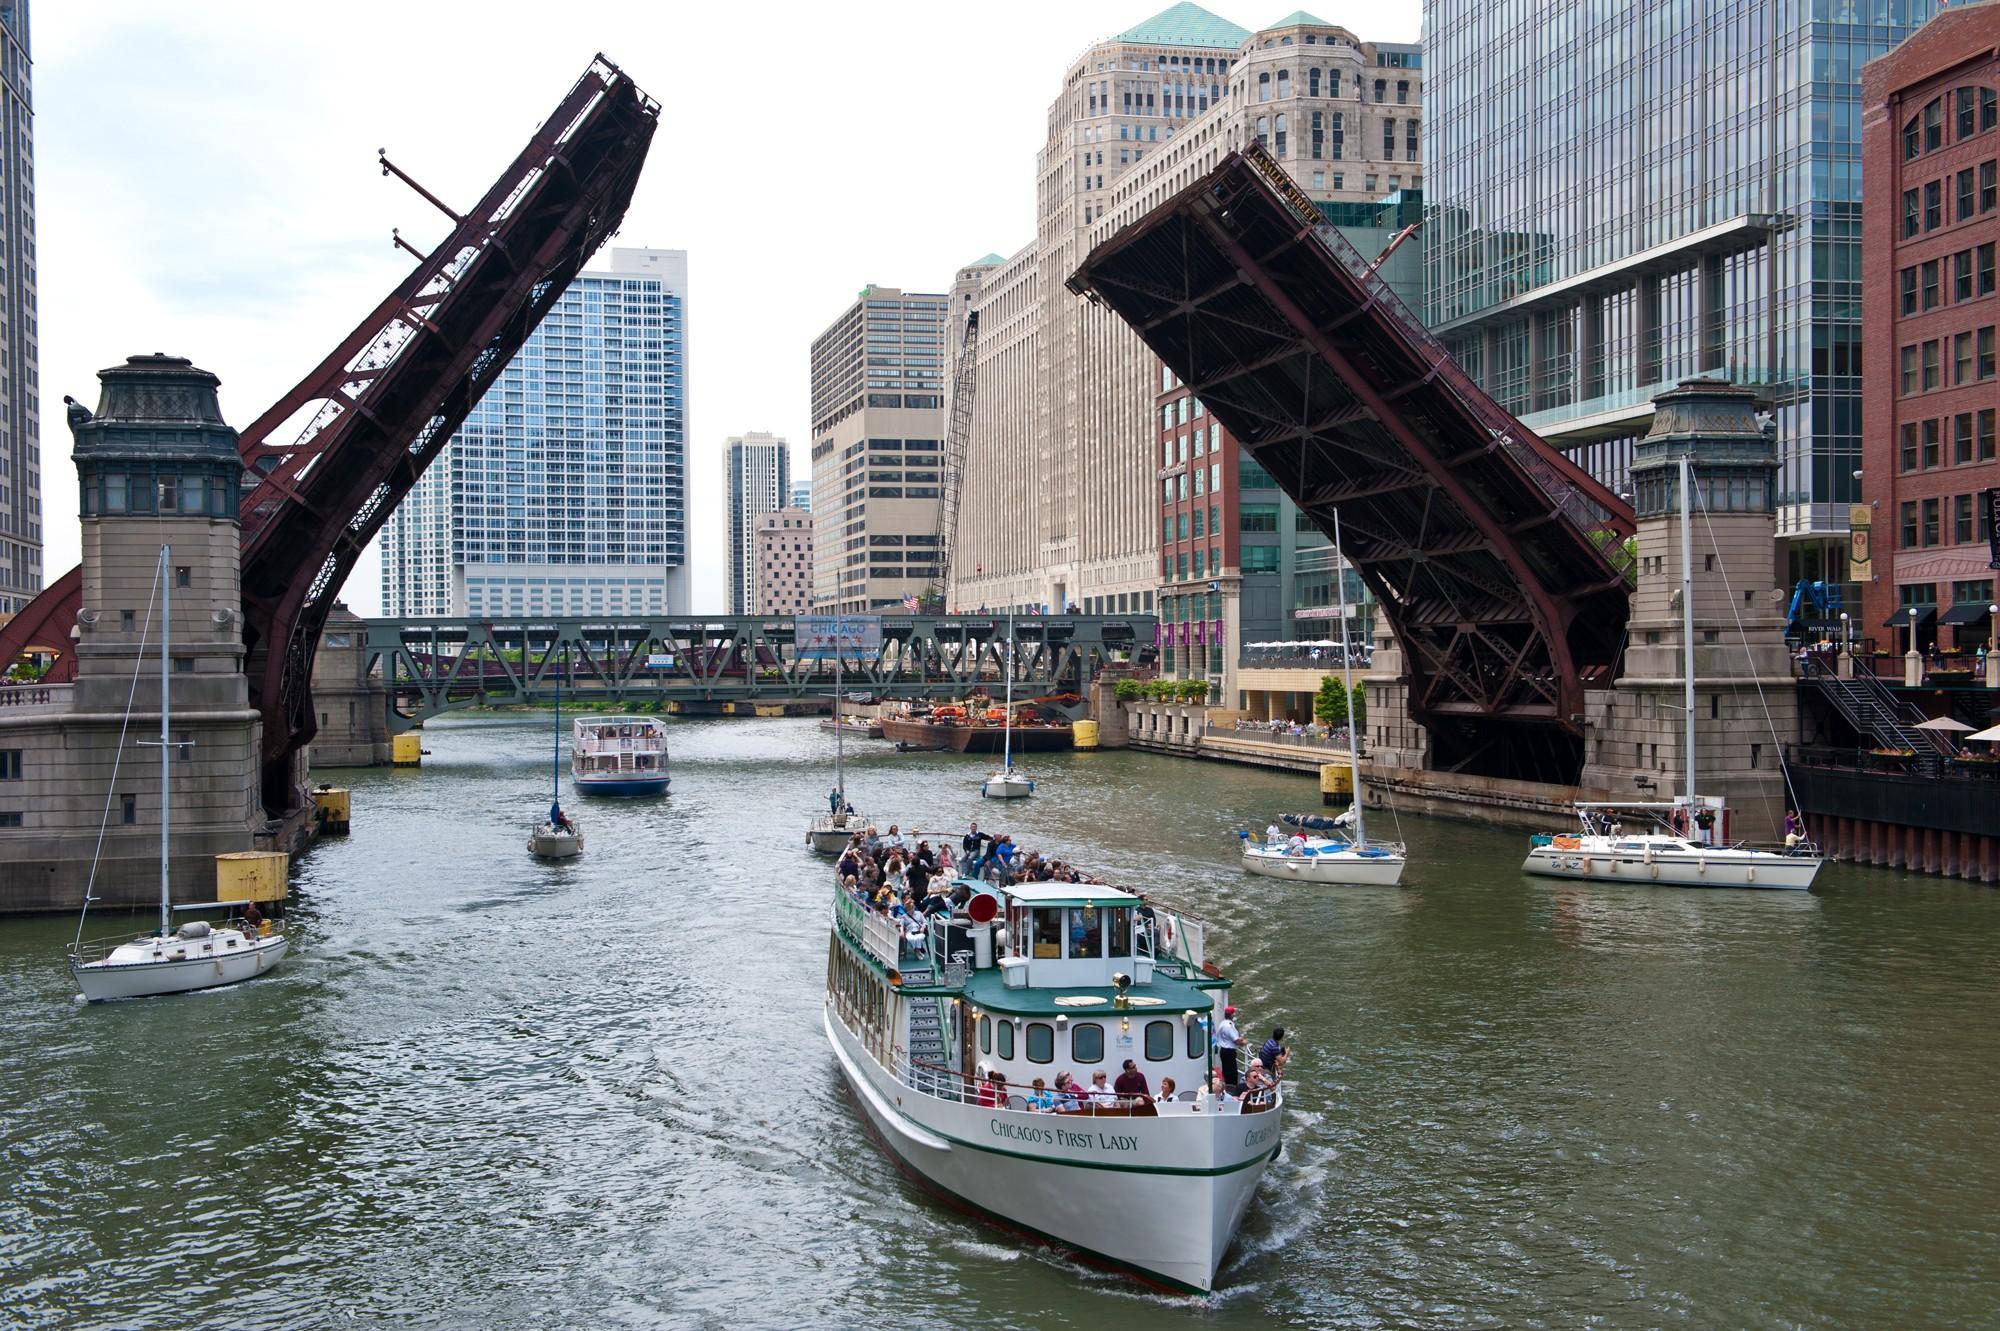 Chicago's movable bridges · Chicago Architecture Center - CAC